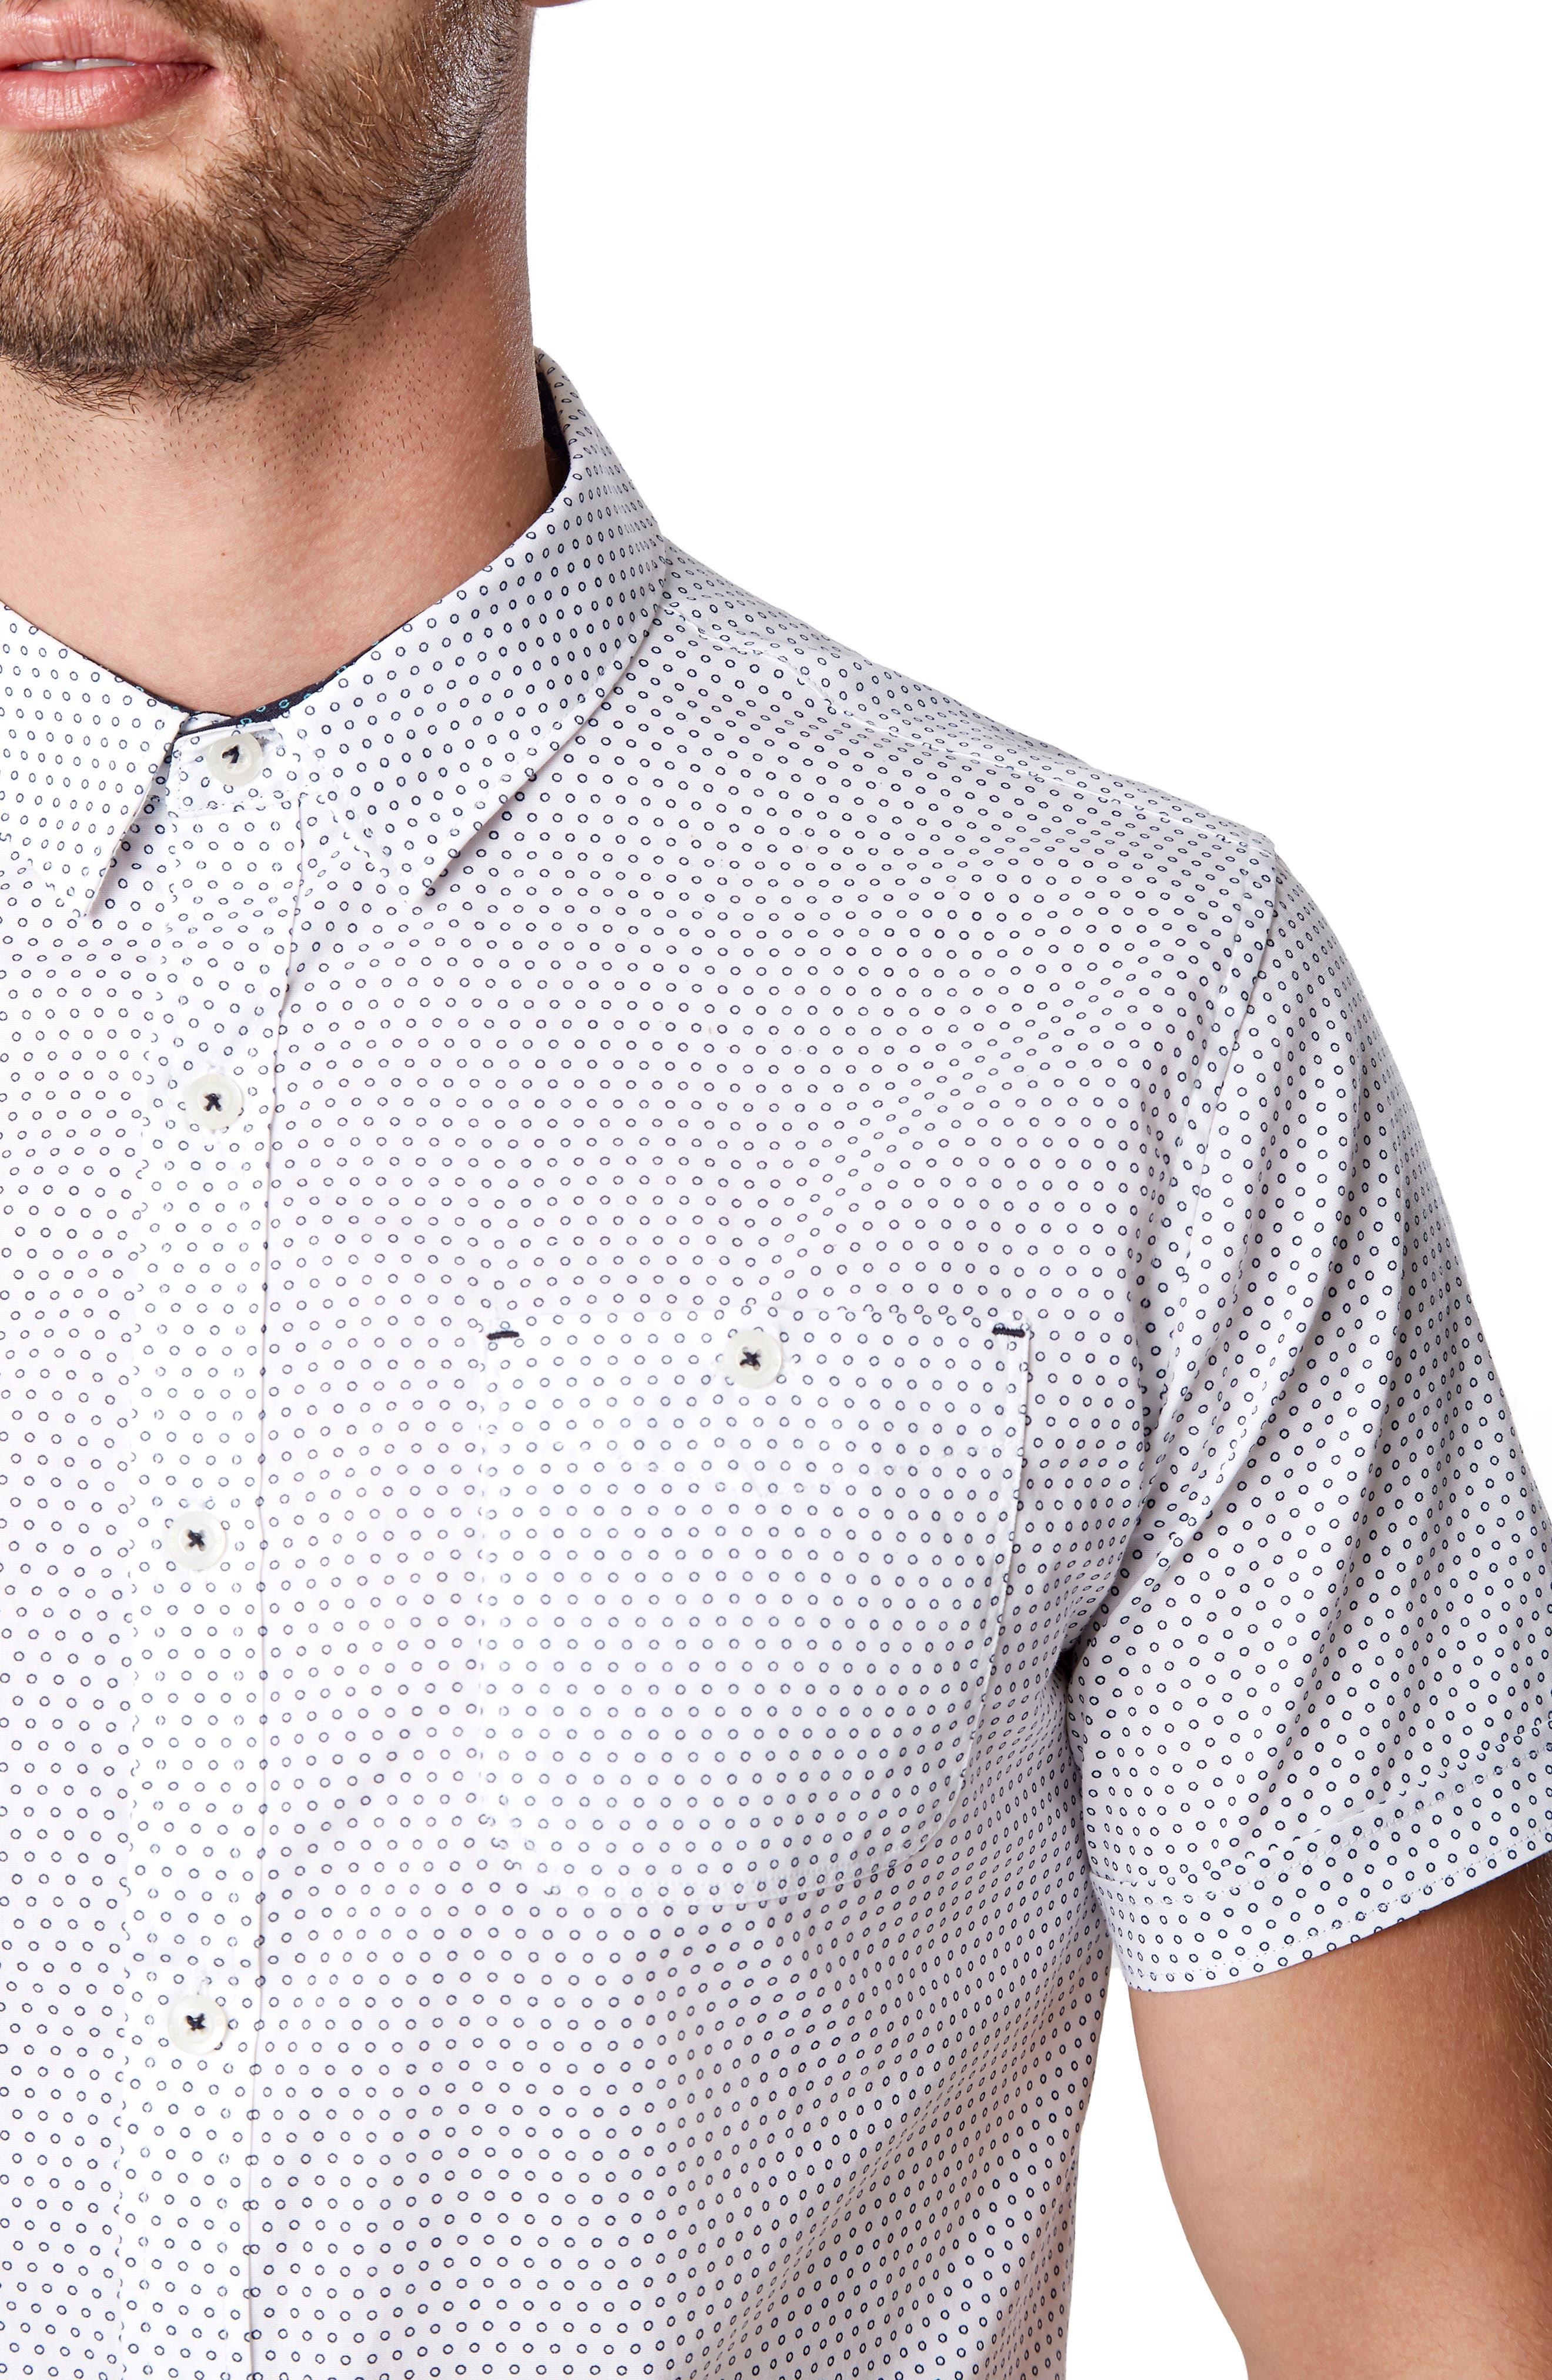 Suavecito Slim Fit Sport Shirt,                             Alternate thumbnail 2, color,                             WHITE